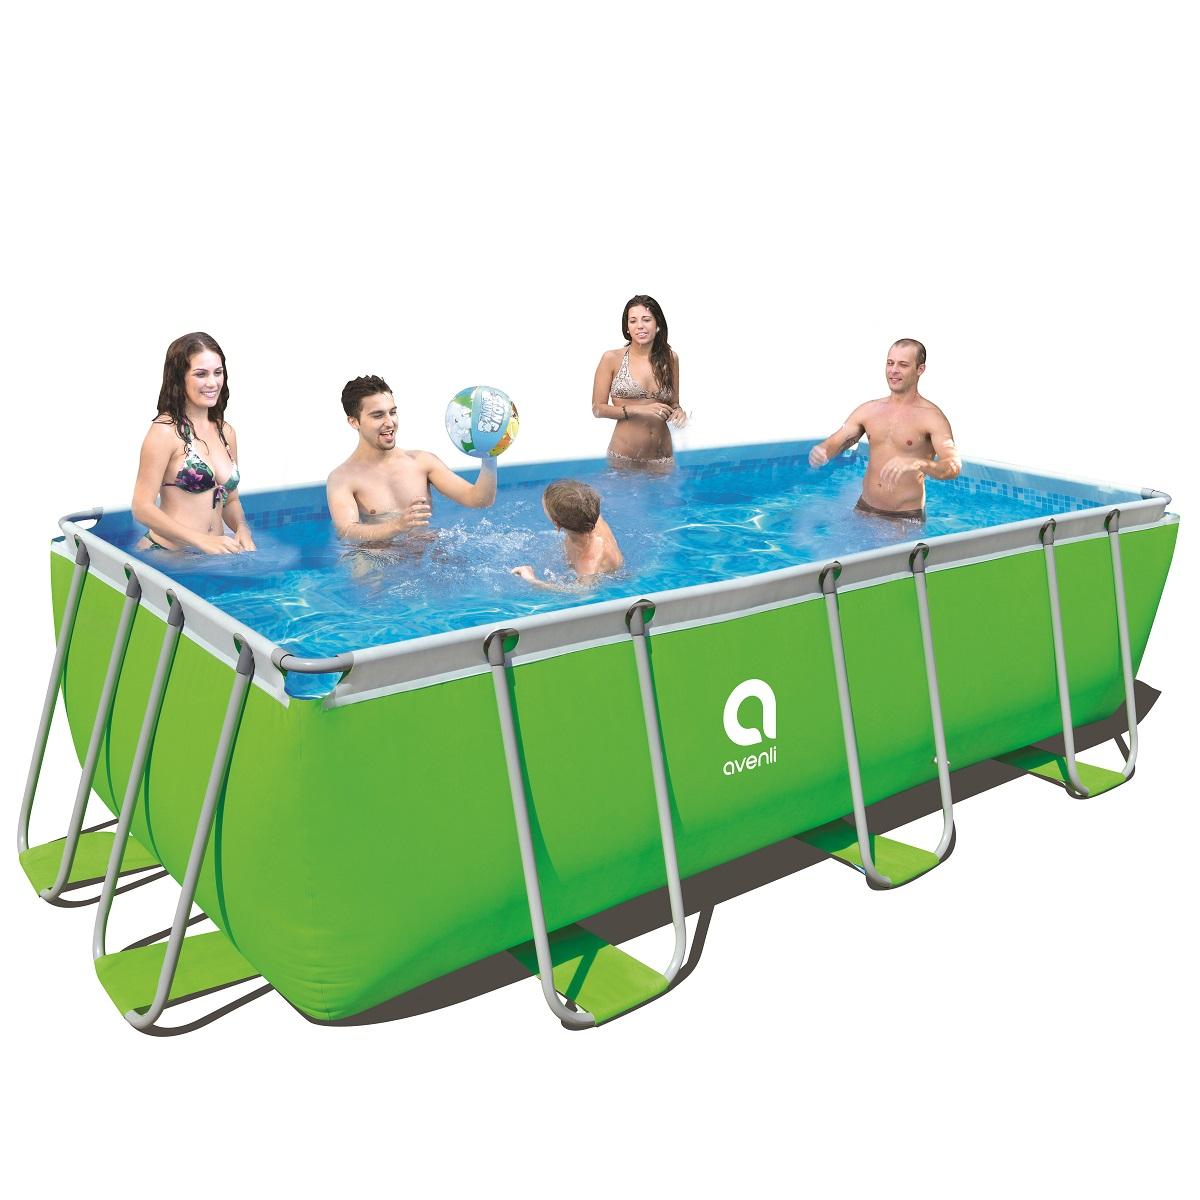 Bazén s pevnou stenou Passaat Green 400 x 200 x 99 cm s kartušovou filtráciou